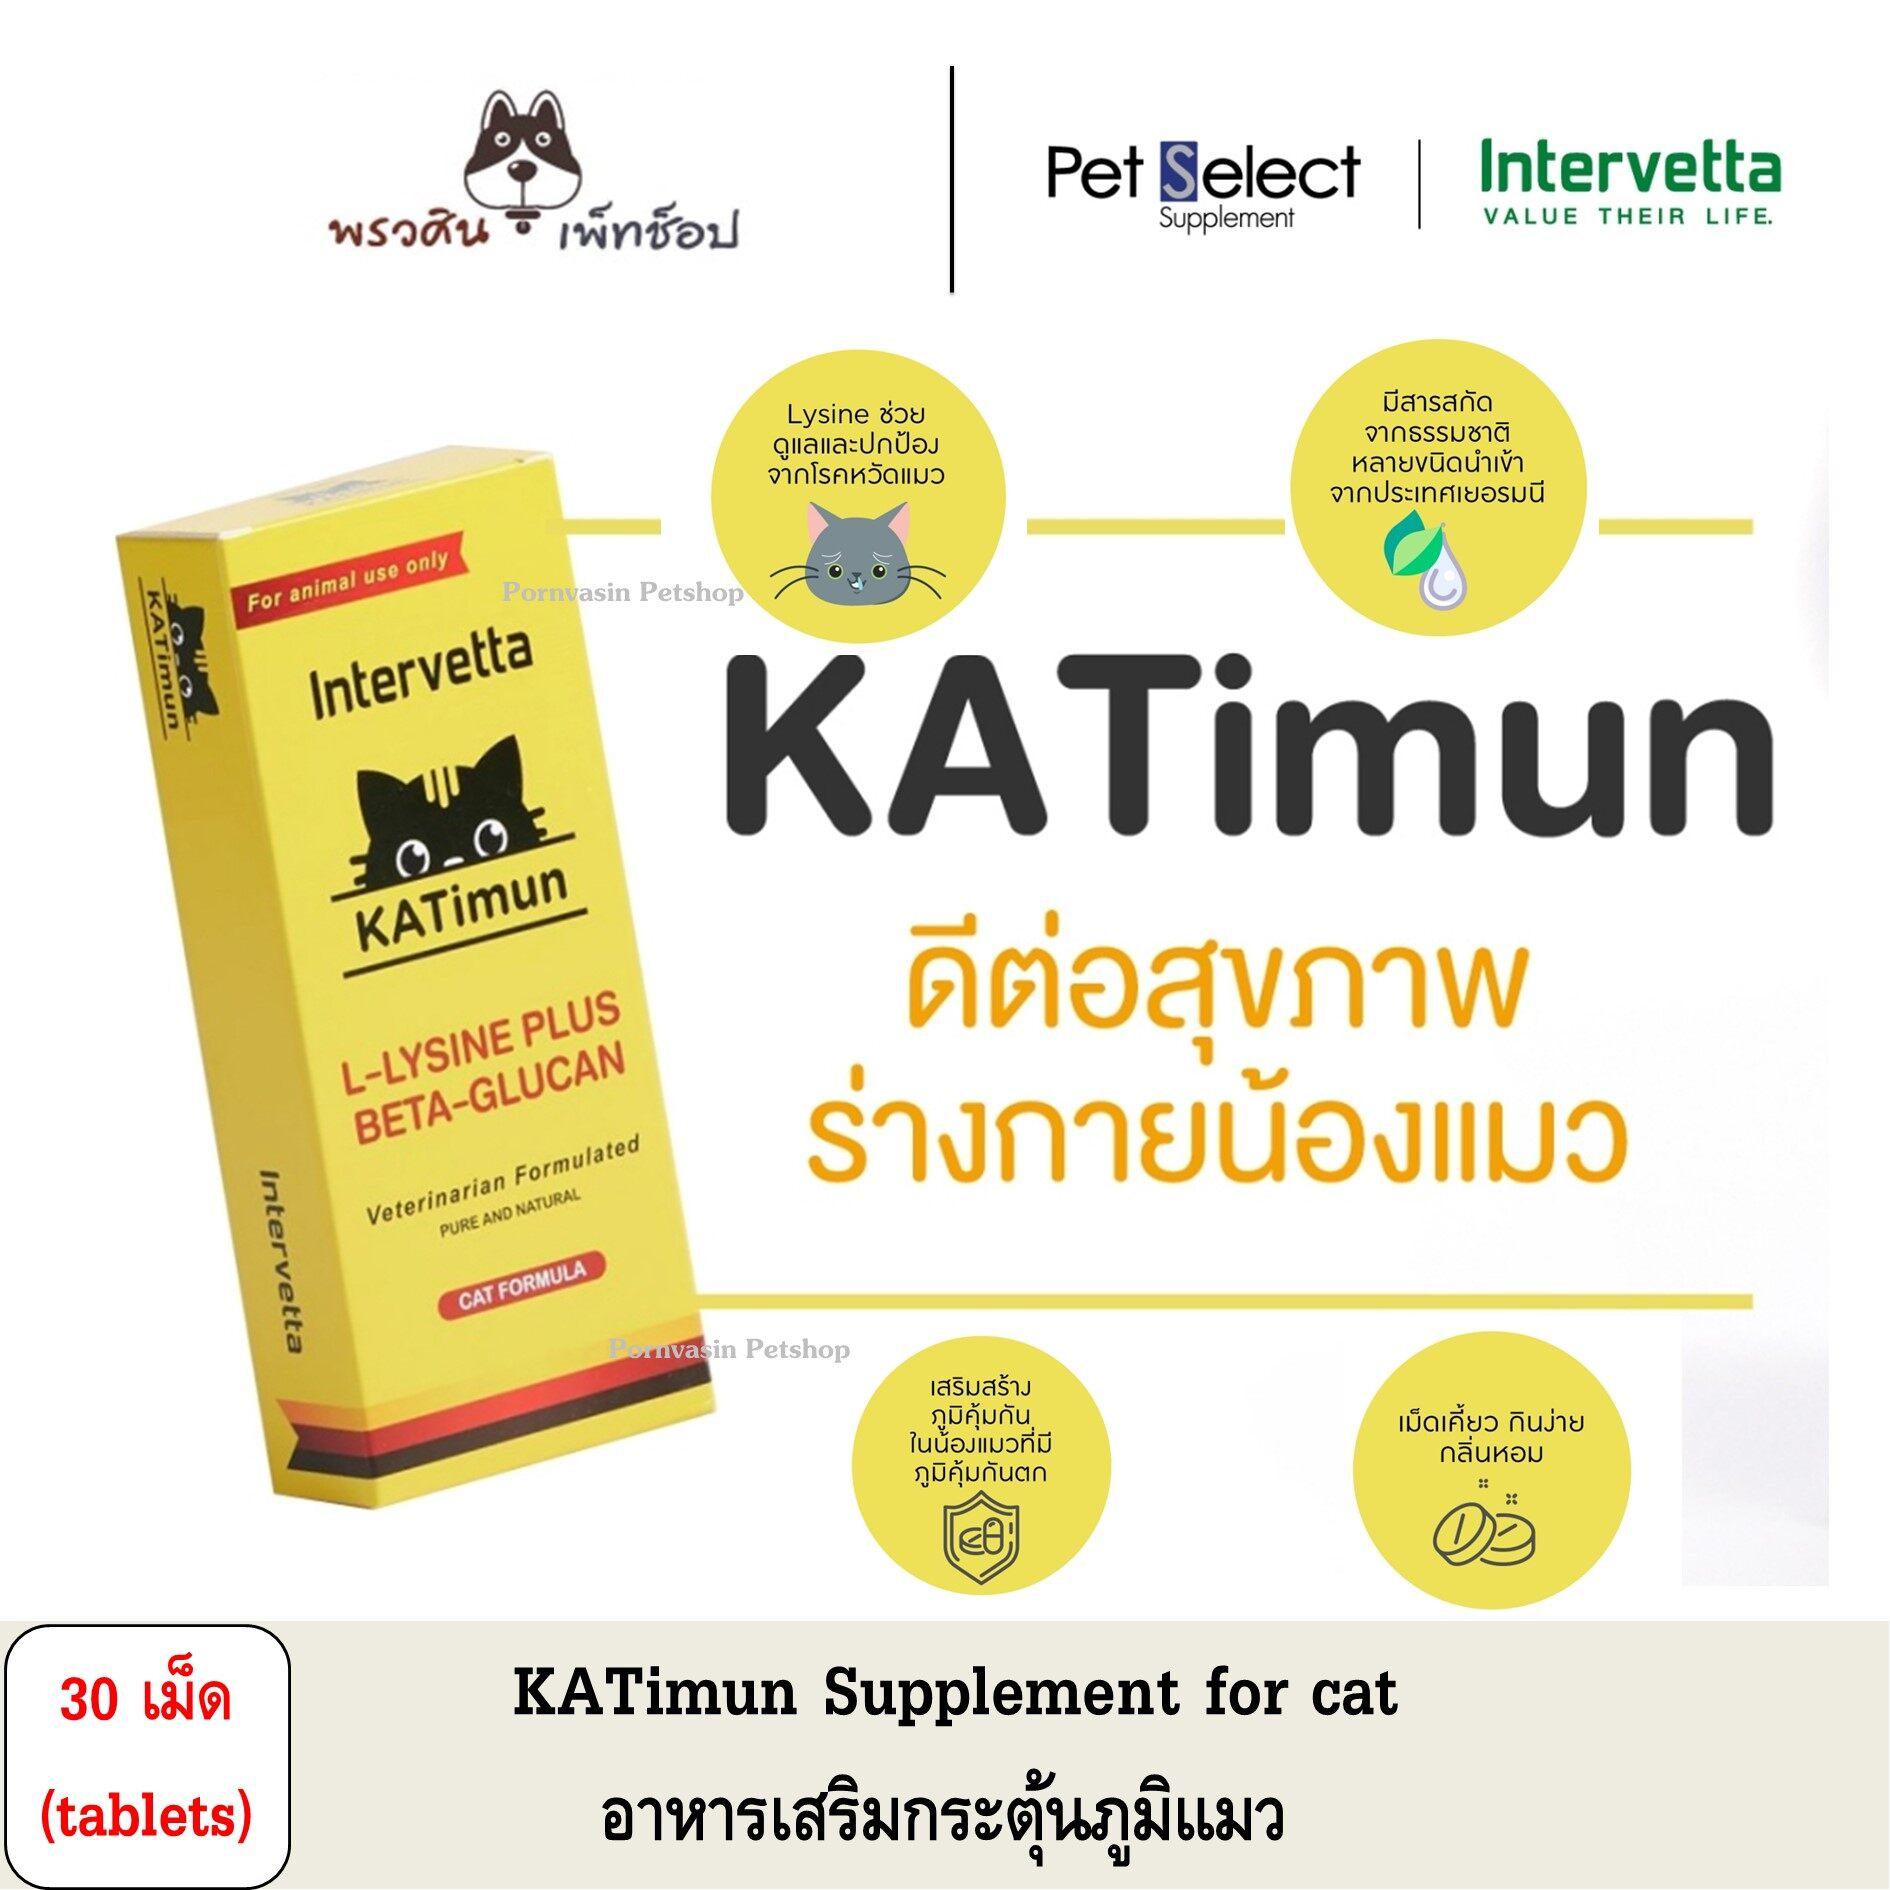 Katimun L-Lysine Plus วิตามินเสริมภูมิแมว Exp 04/2022.